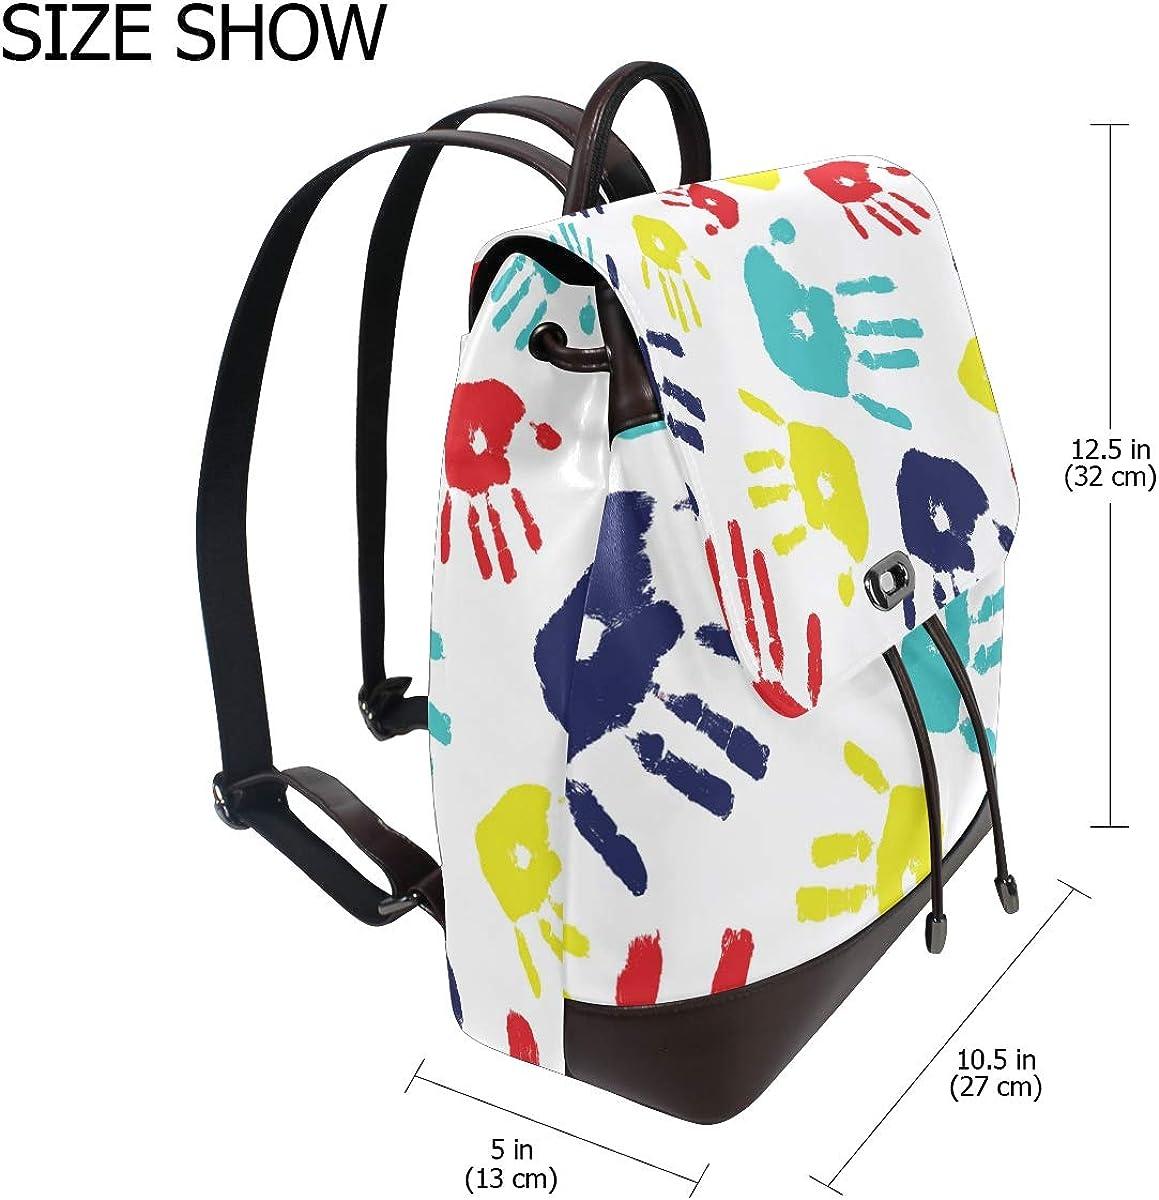 PU Leather Shoulder Bag,Palm Print Backpack,Portable Travel School Rucksack,Satchel with Top Handle